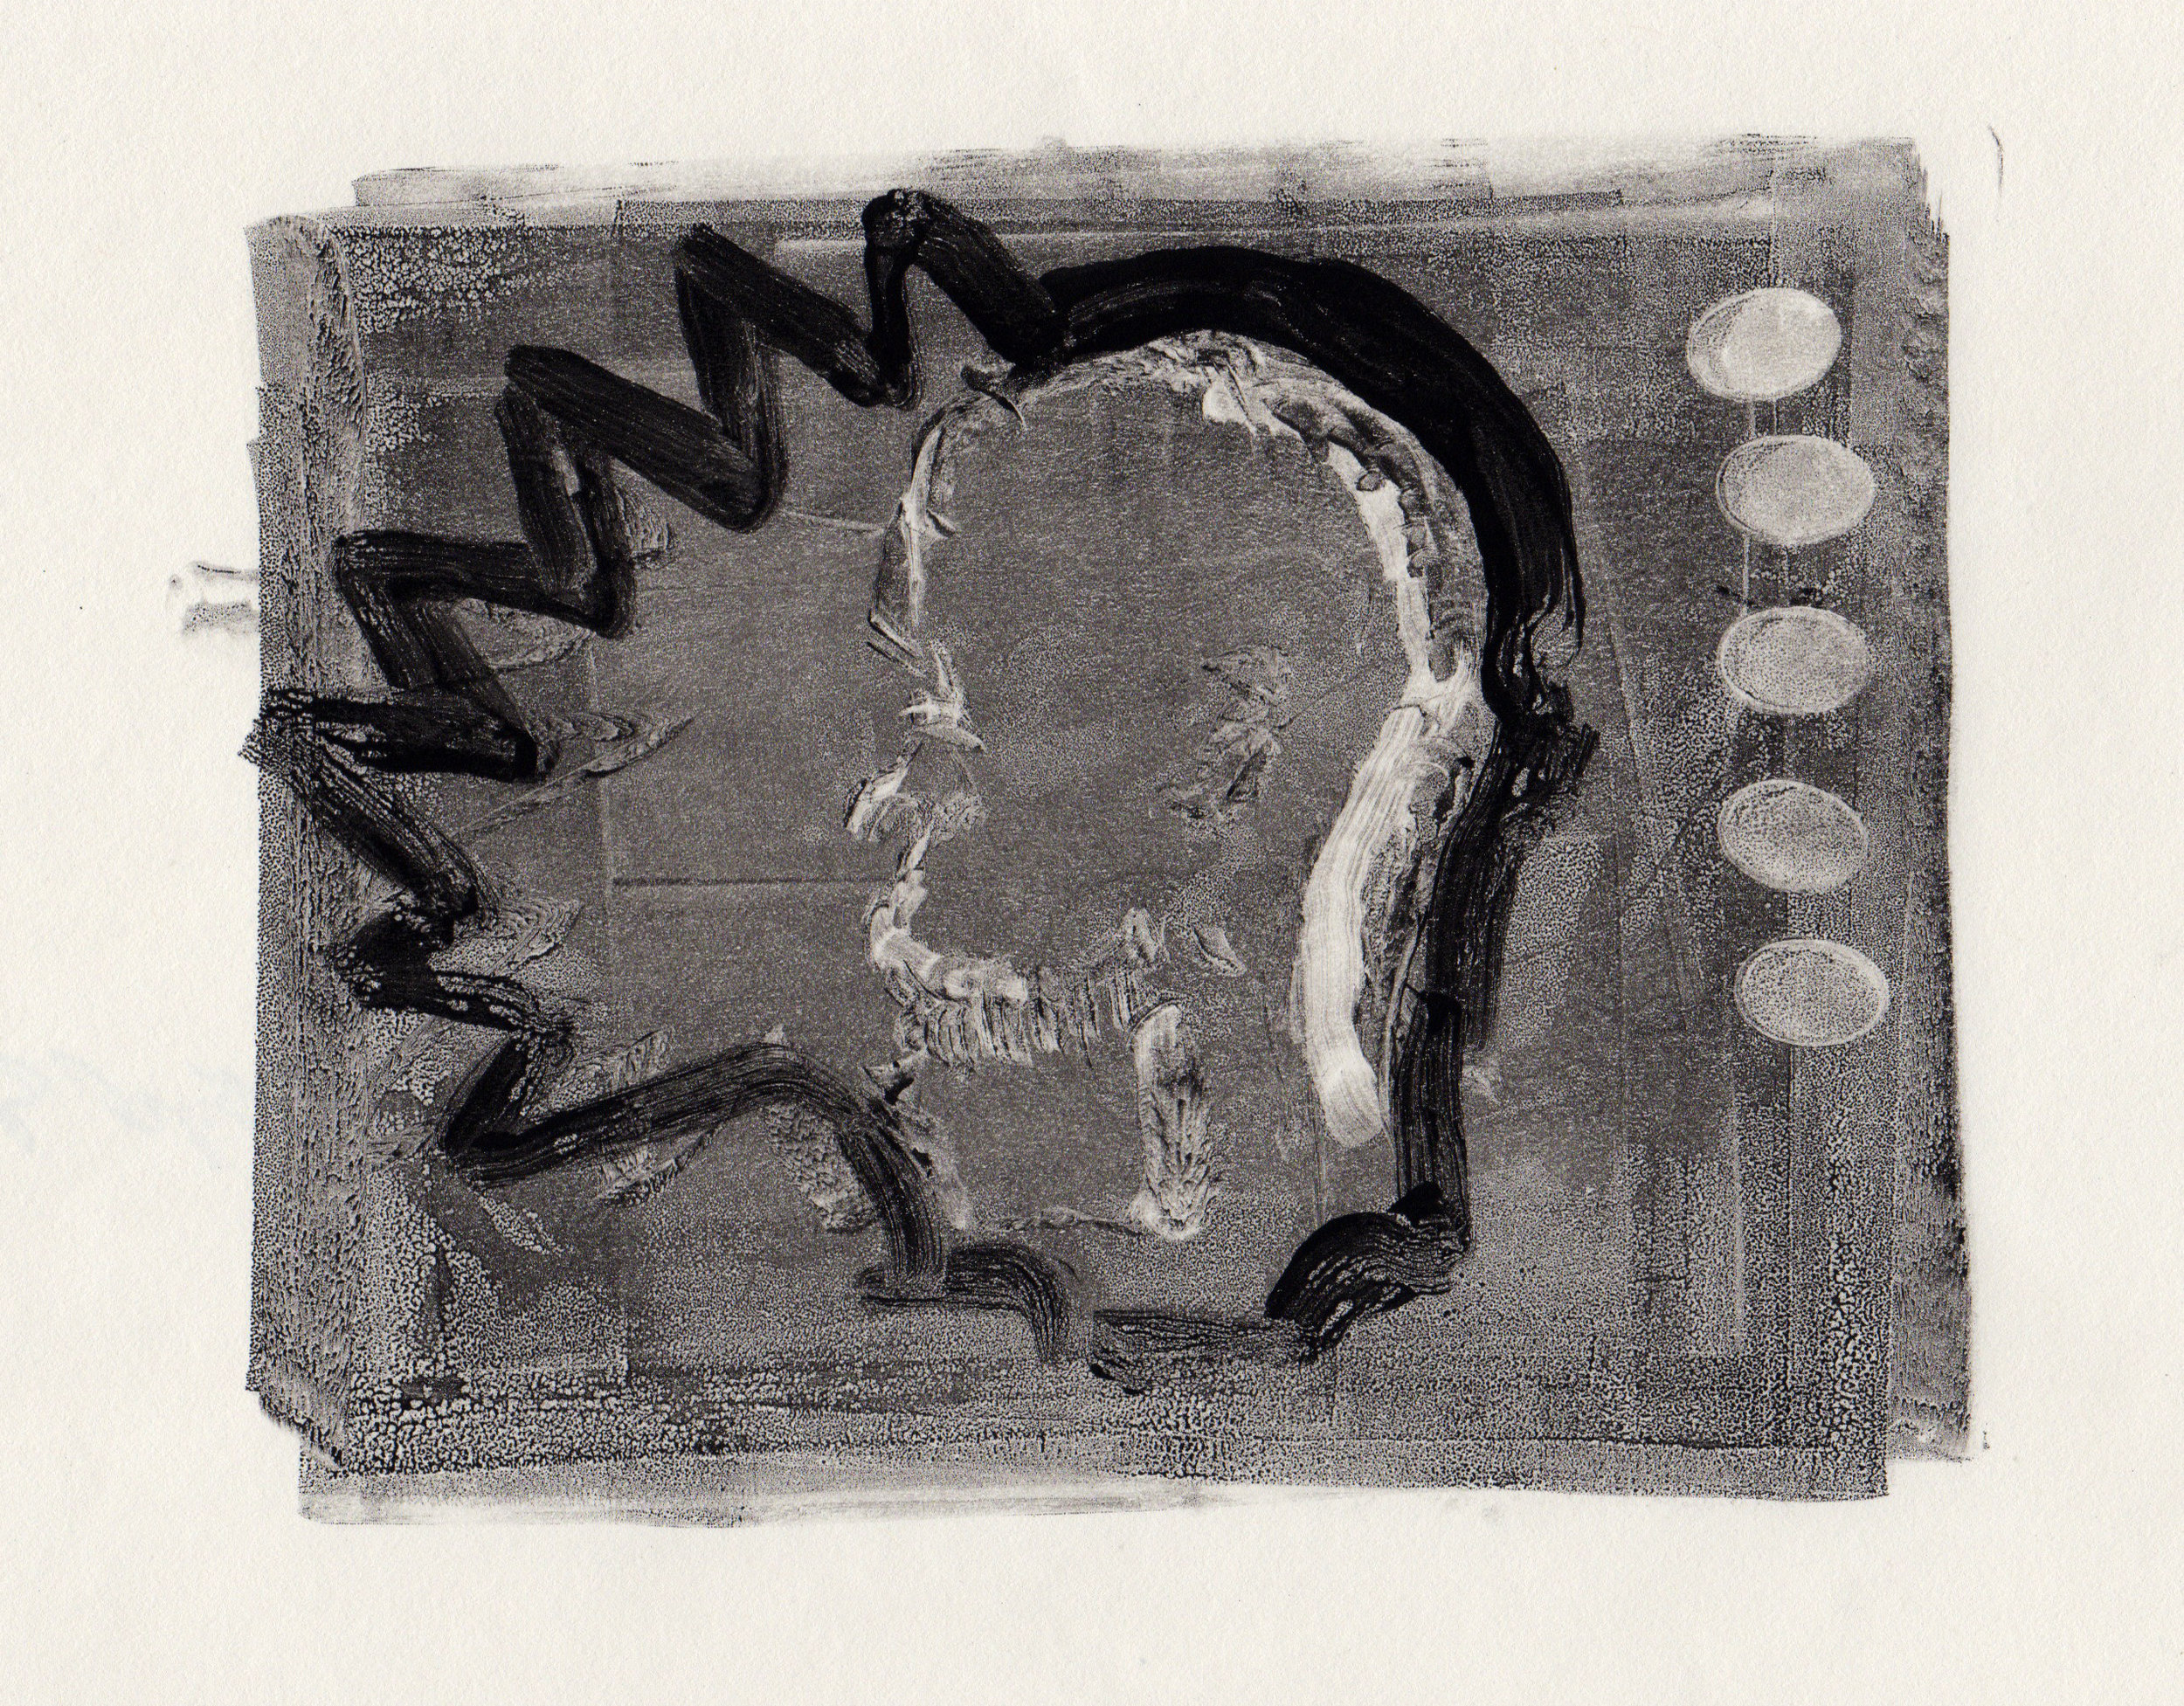 Gleam, 2014, gelatin monotype, 10x9 inches